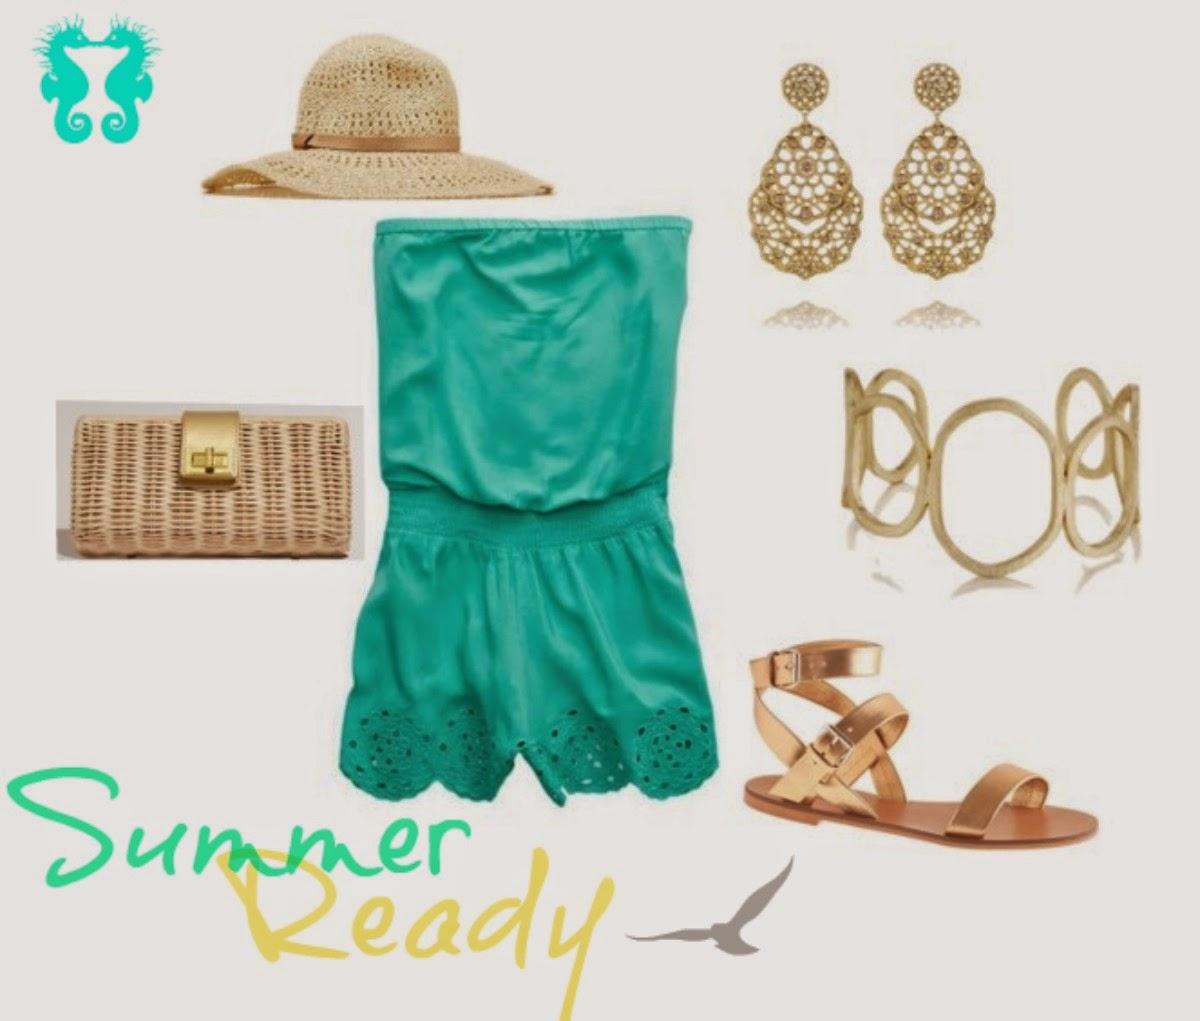 Summer Ready…